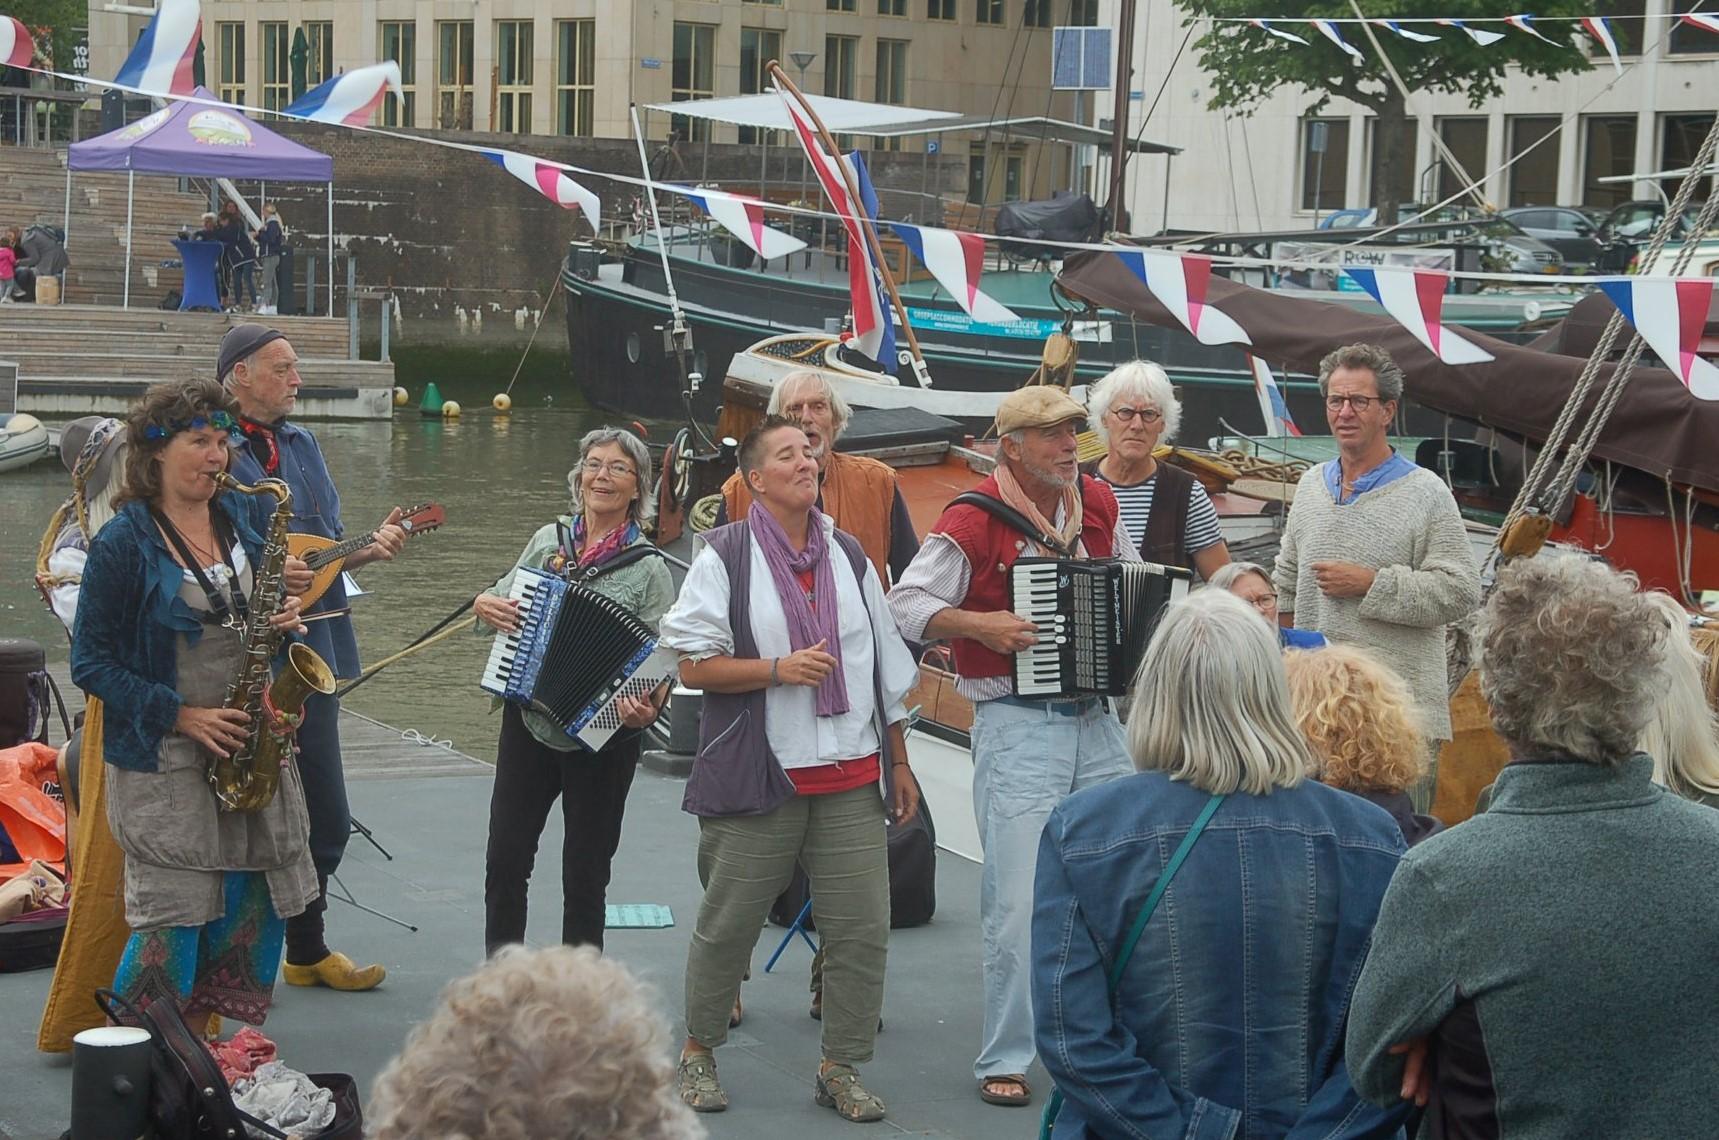 muziek in de museumhaven Rotterdam